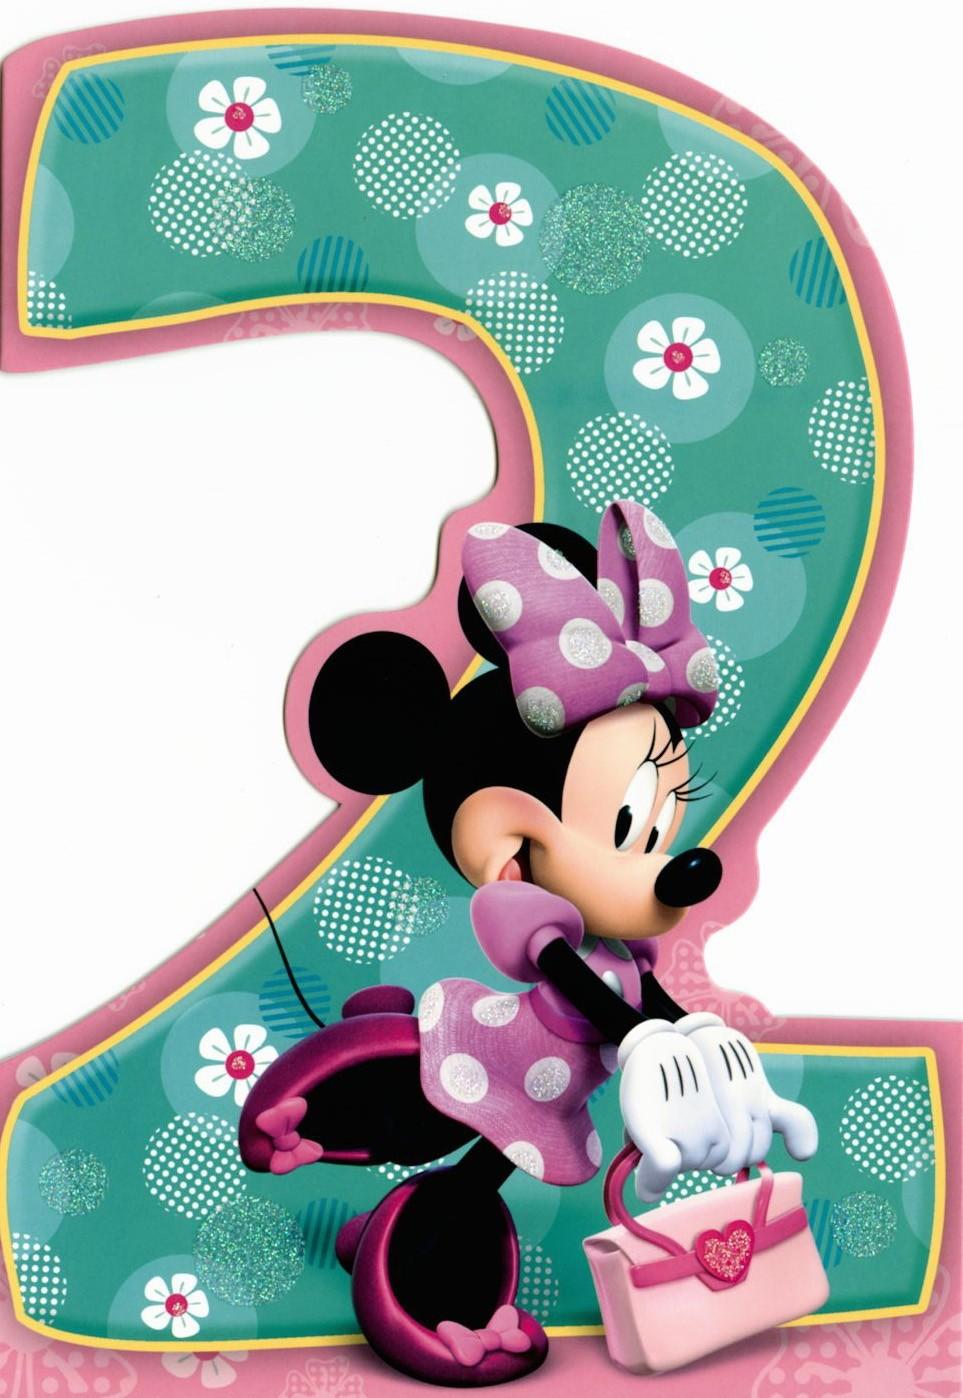 A Disney Birthday Card From Hallmark